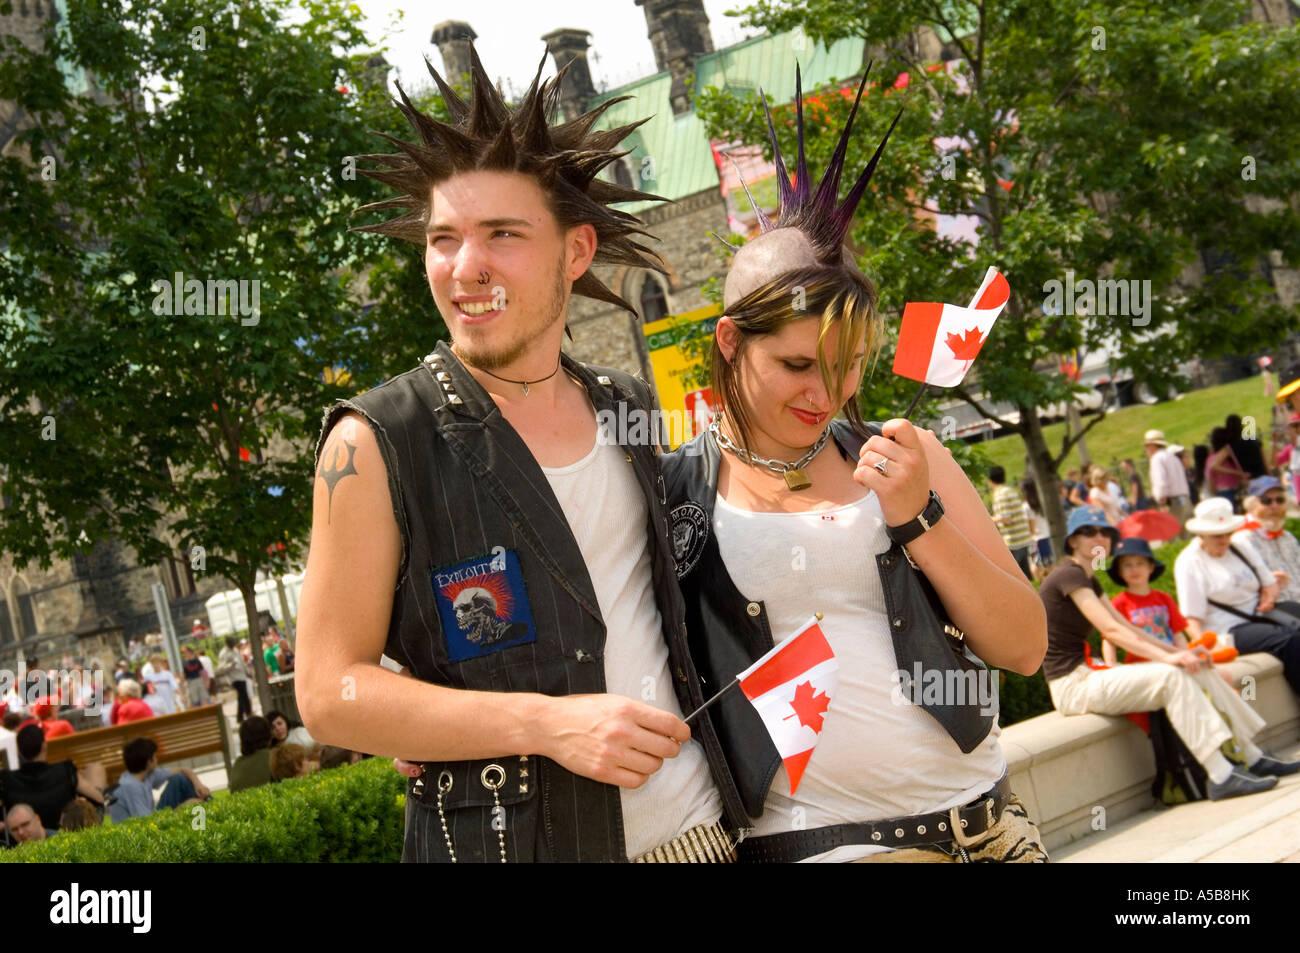 Two punk Canadians celebrating Canada Day. - Stock Image